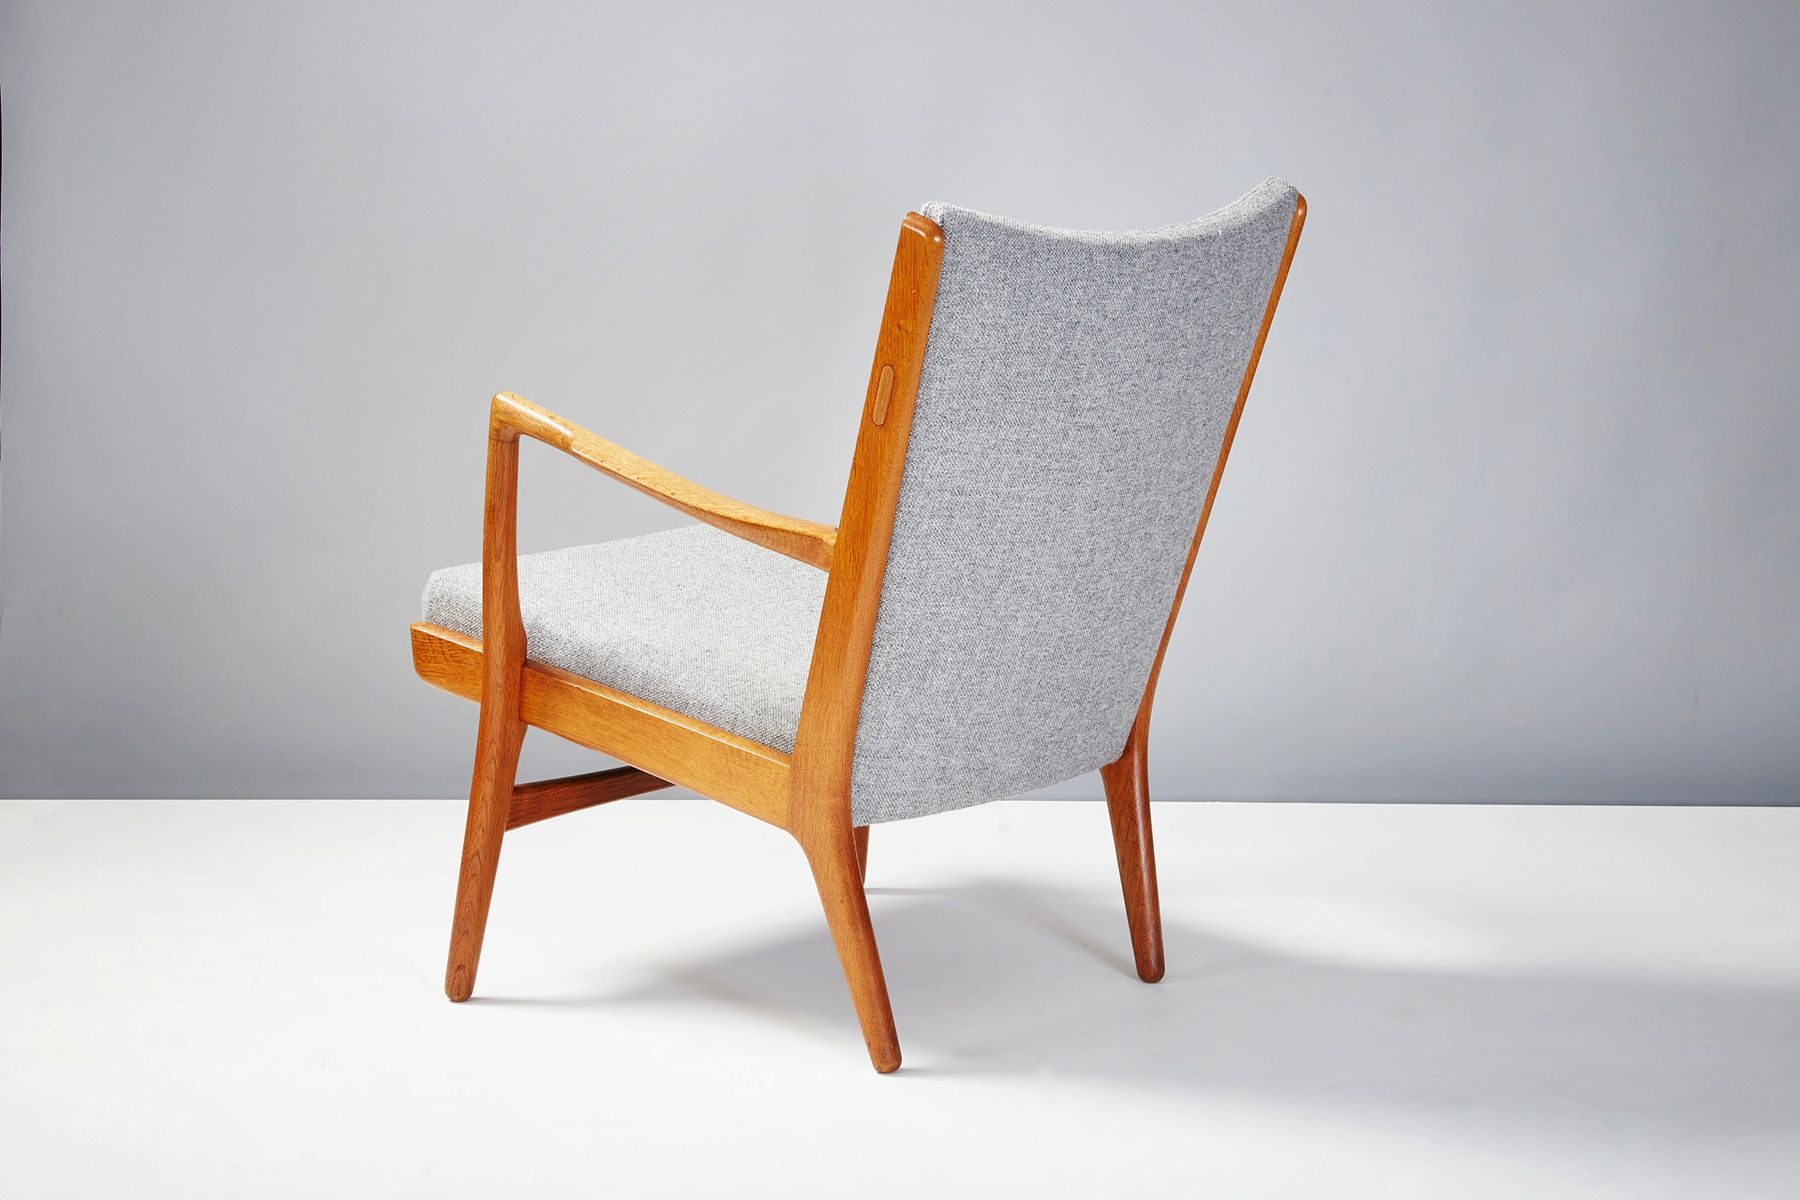 ap 16 st hle von hans wegner 1952 2er set bei pamono kaufen. Black Bedroom Furniture Sets. Home Design Ideas